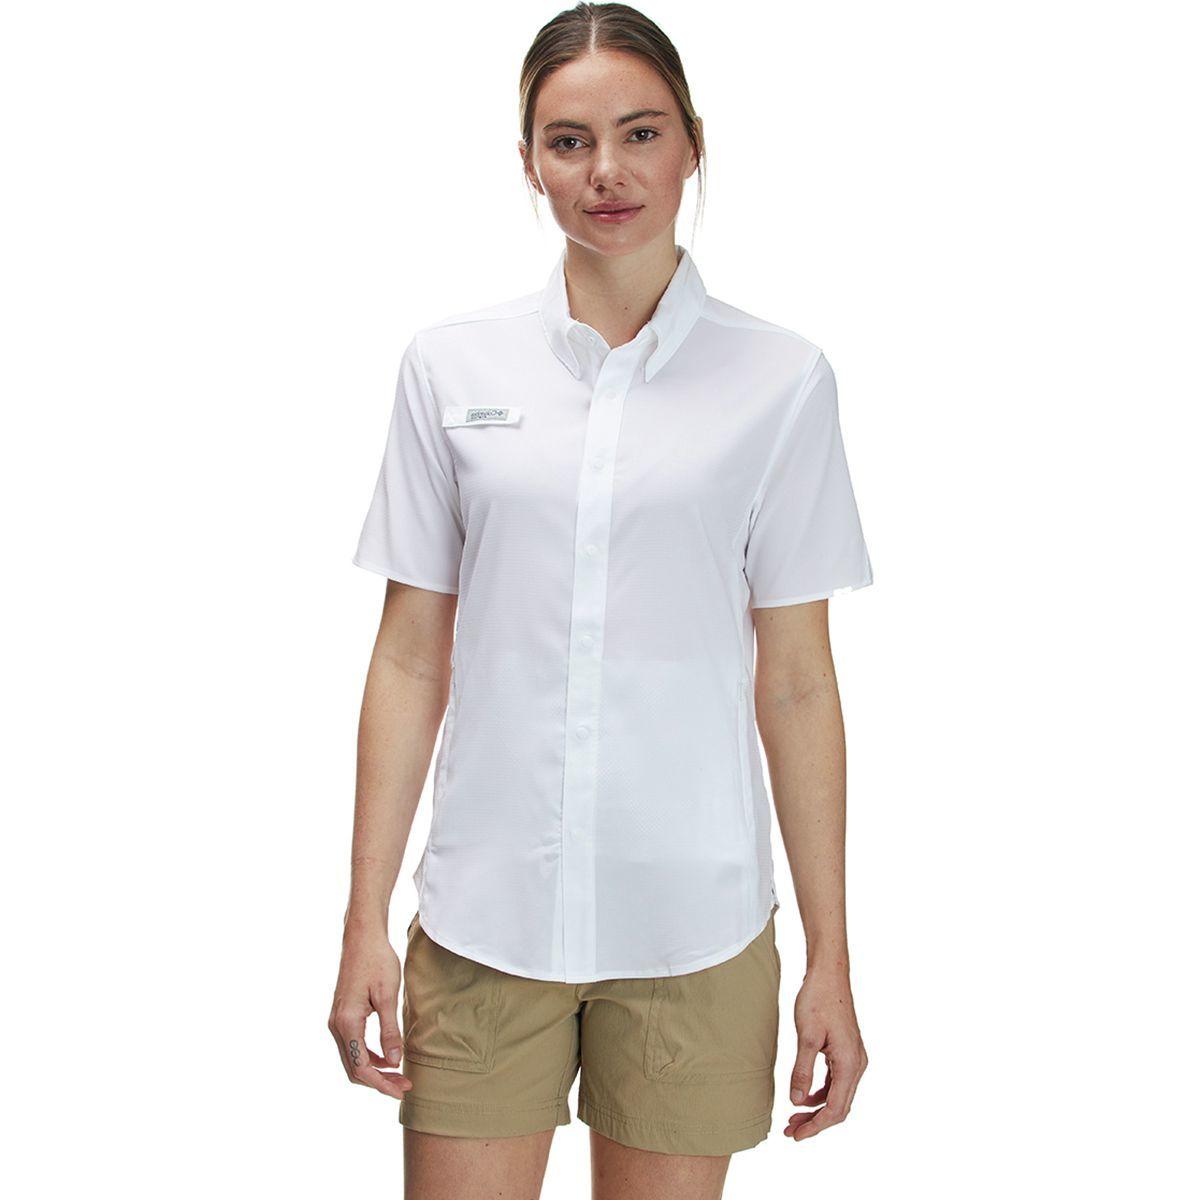 Columbia Tamiami II Short-Sleeve Shirt - Women's